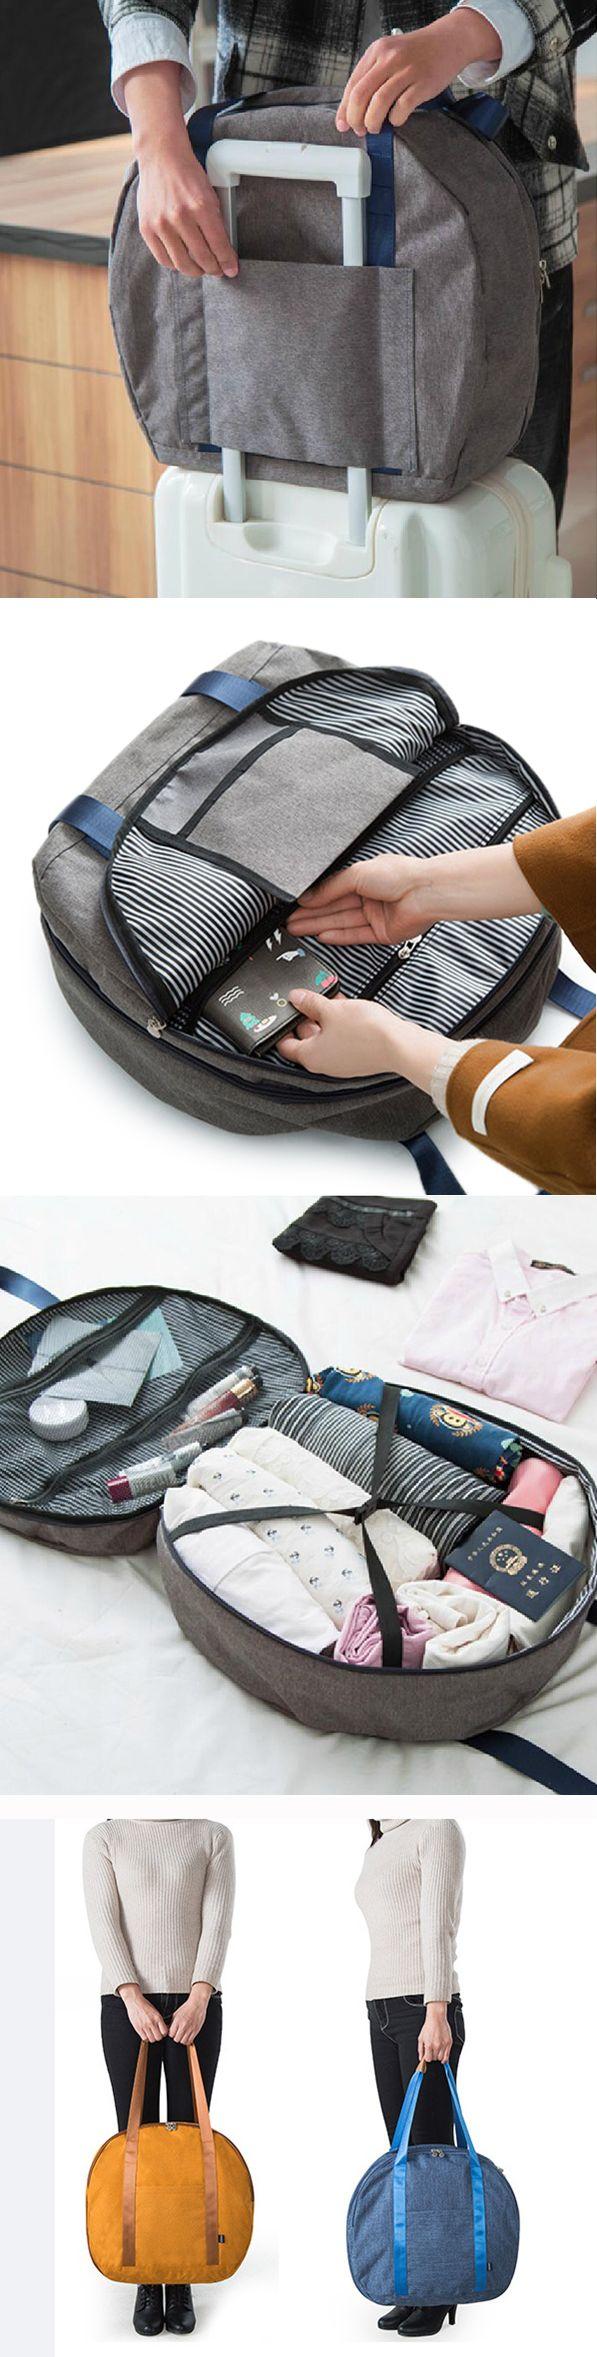 US$21.35 Nylon Casual Travel Clothes Storage Bag Handbag Shoulder Bags Luggage Bag